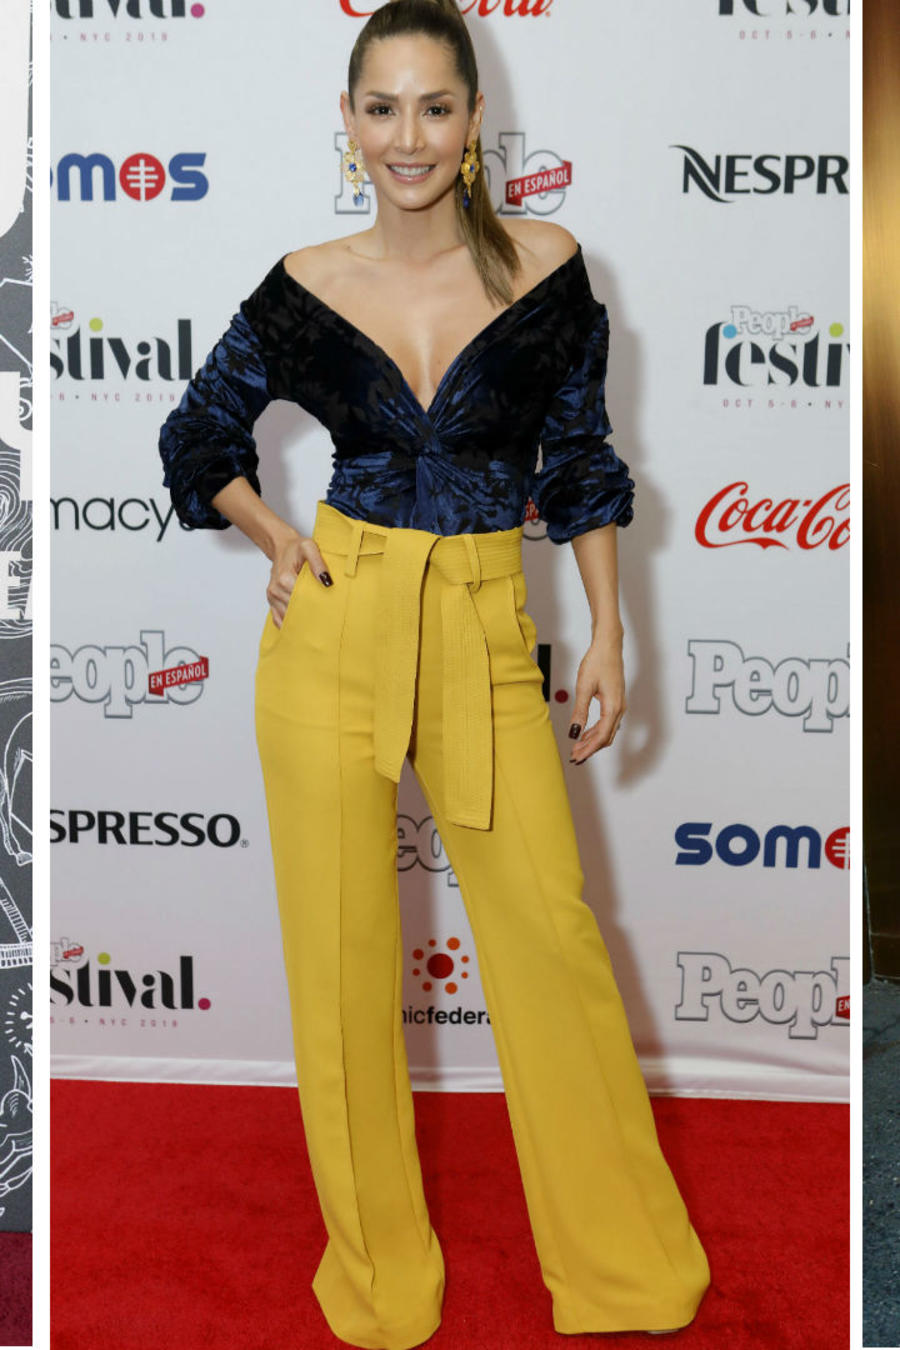 Thalia, Carmen Villalobos y Selena Gomez